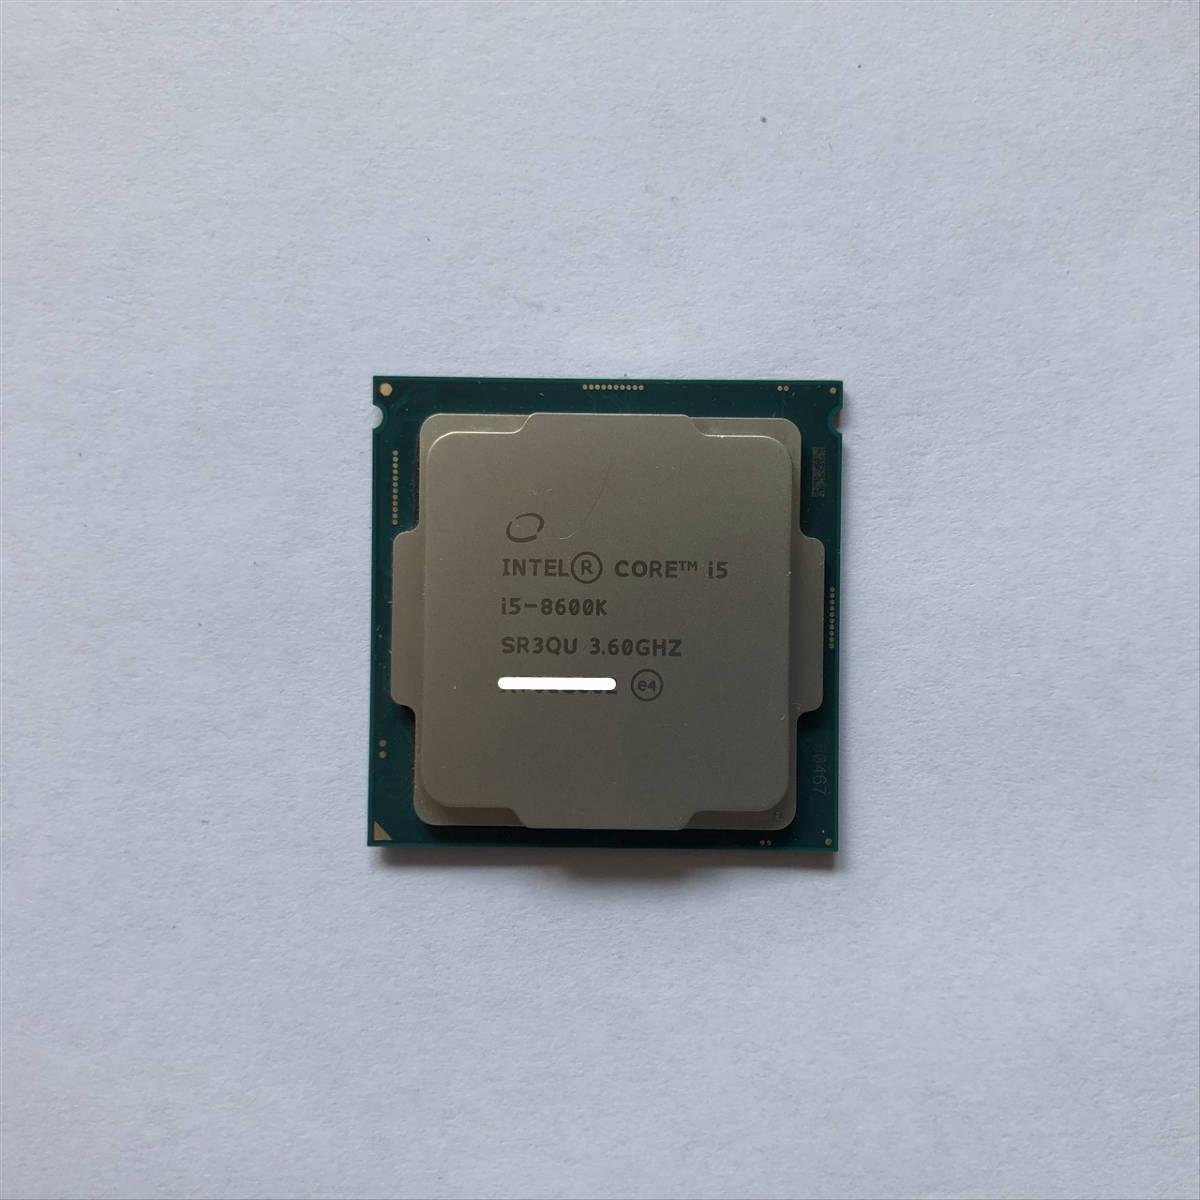 Intel Core i5-8600K SR3QU 3.60GHZ